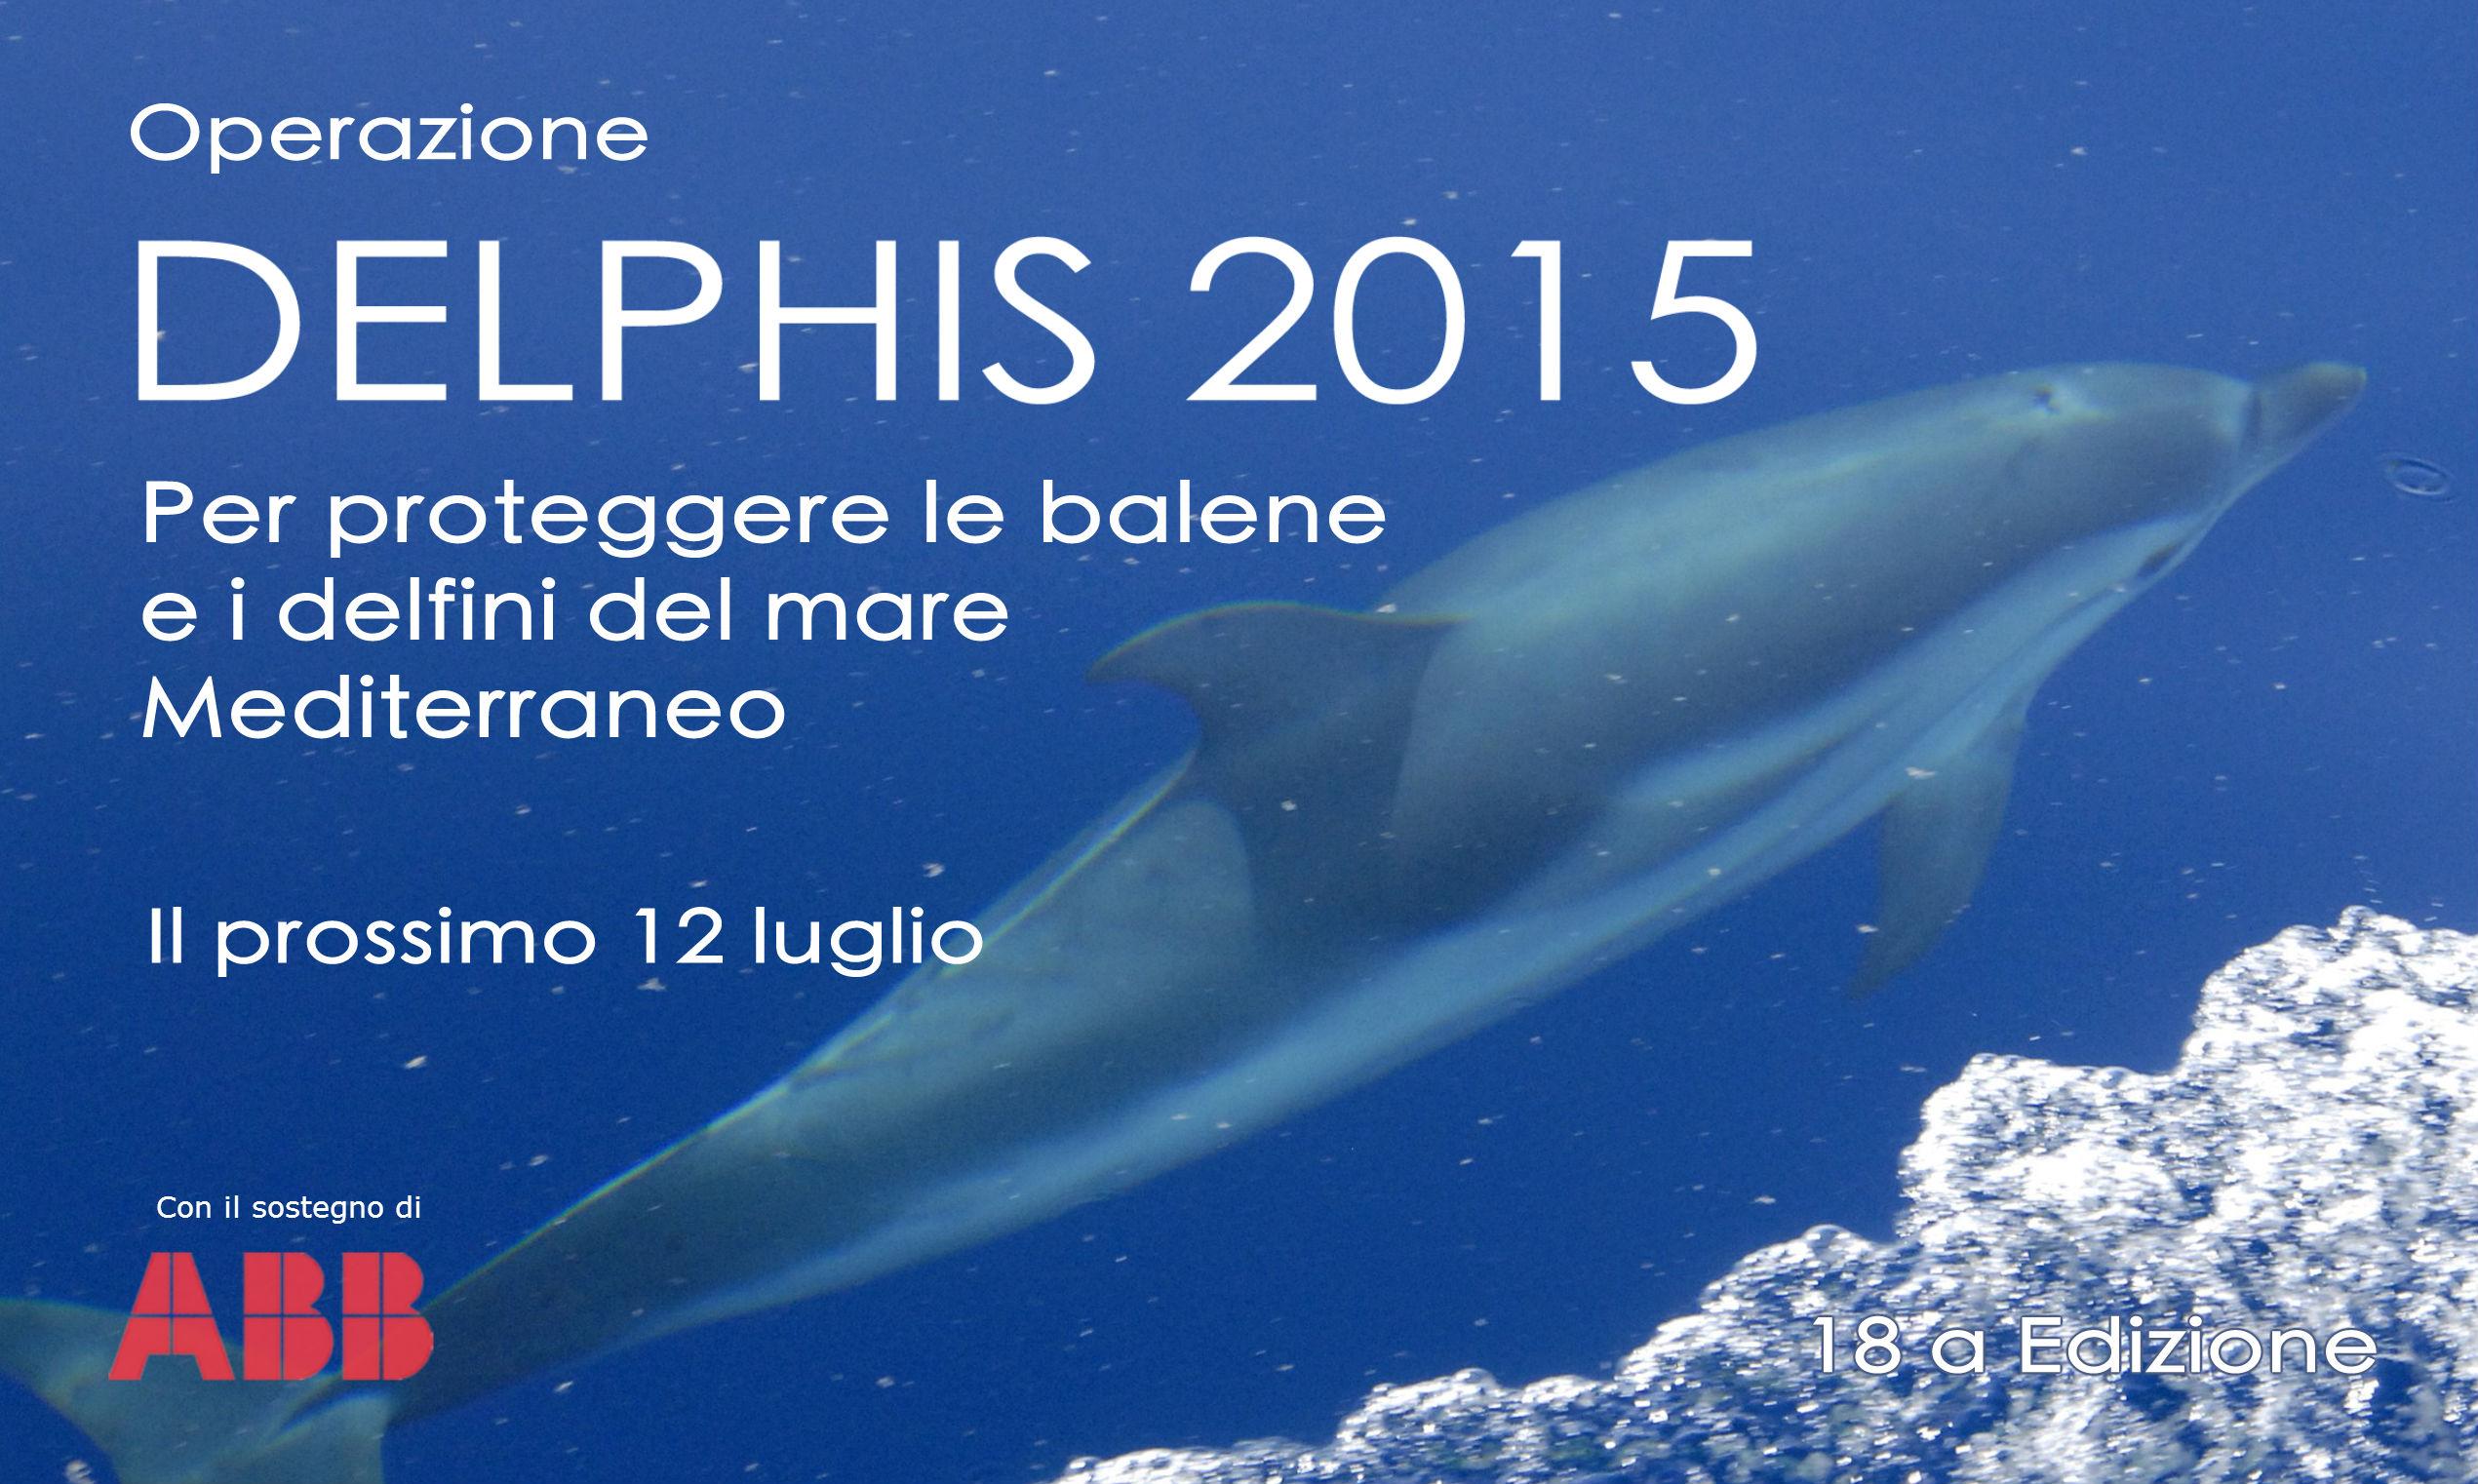 depliant delphis 2015 abb3